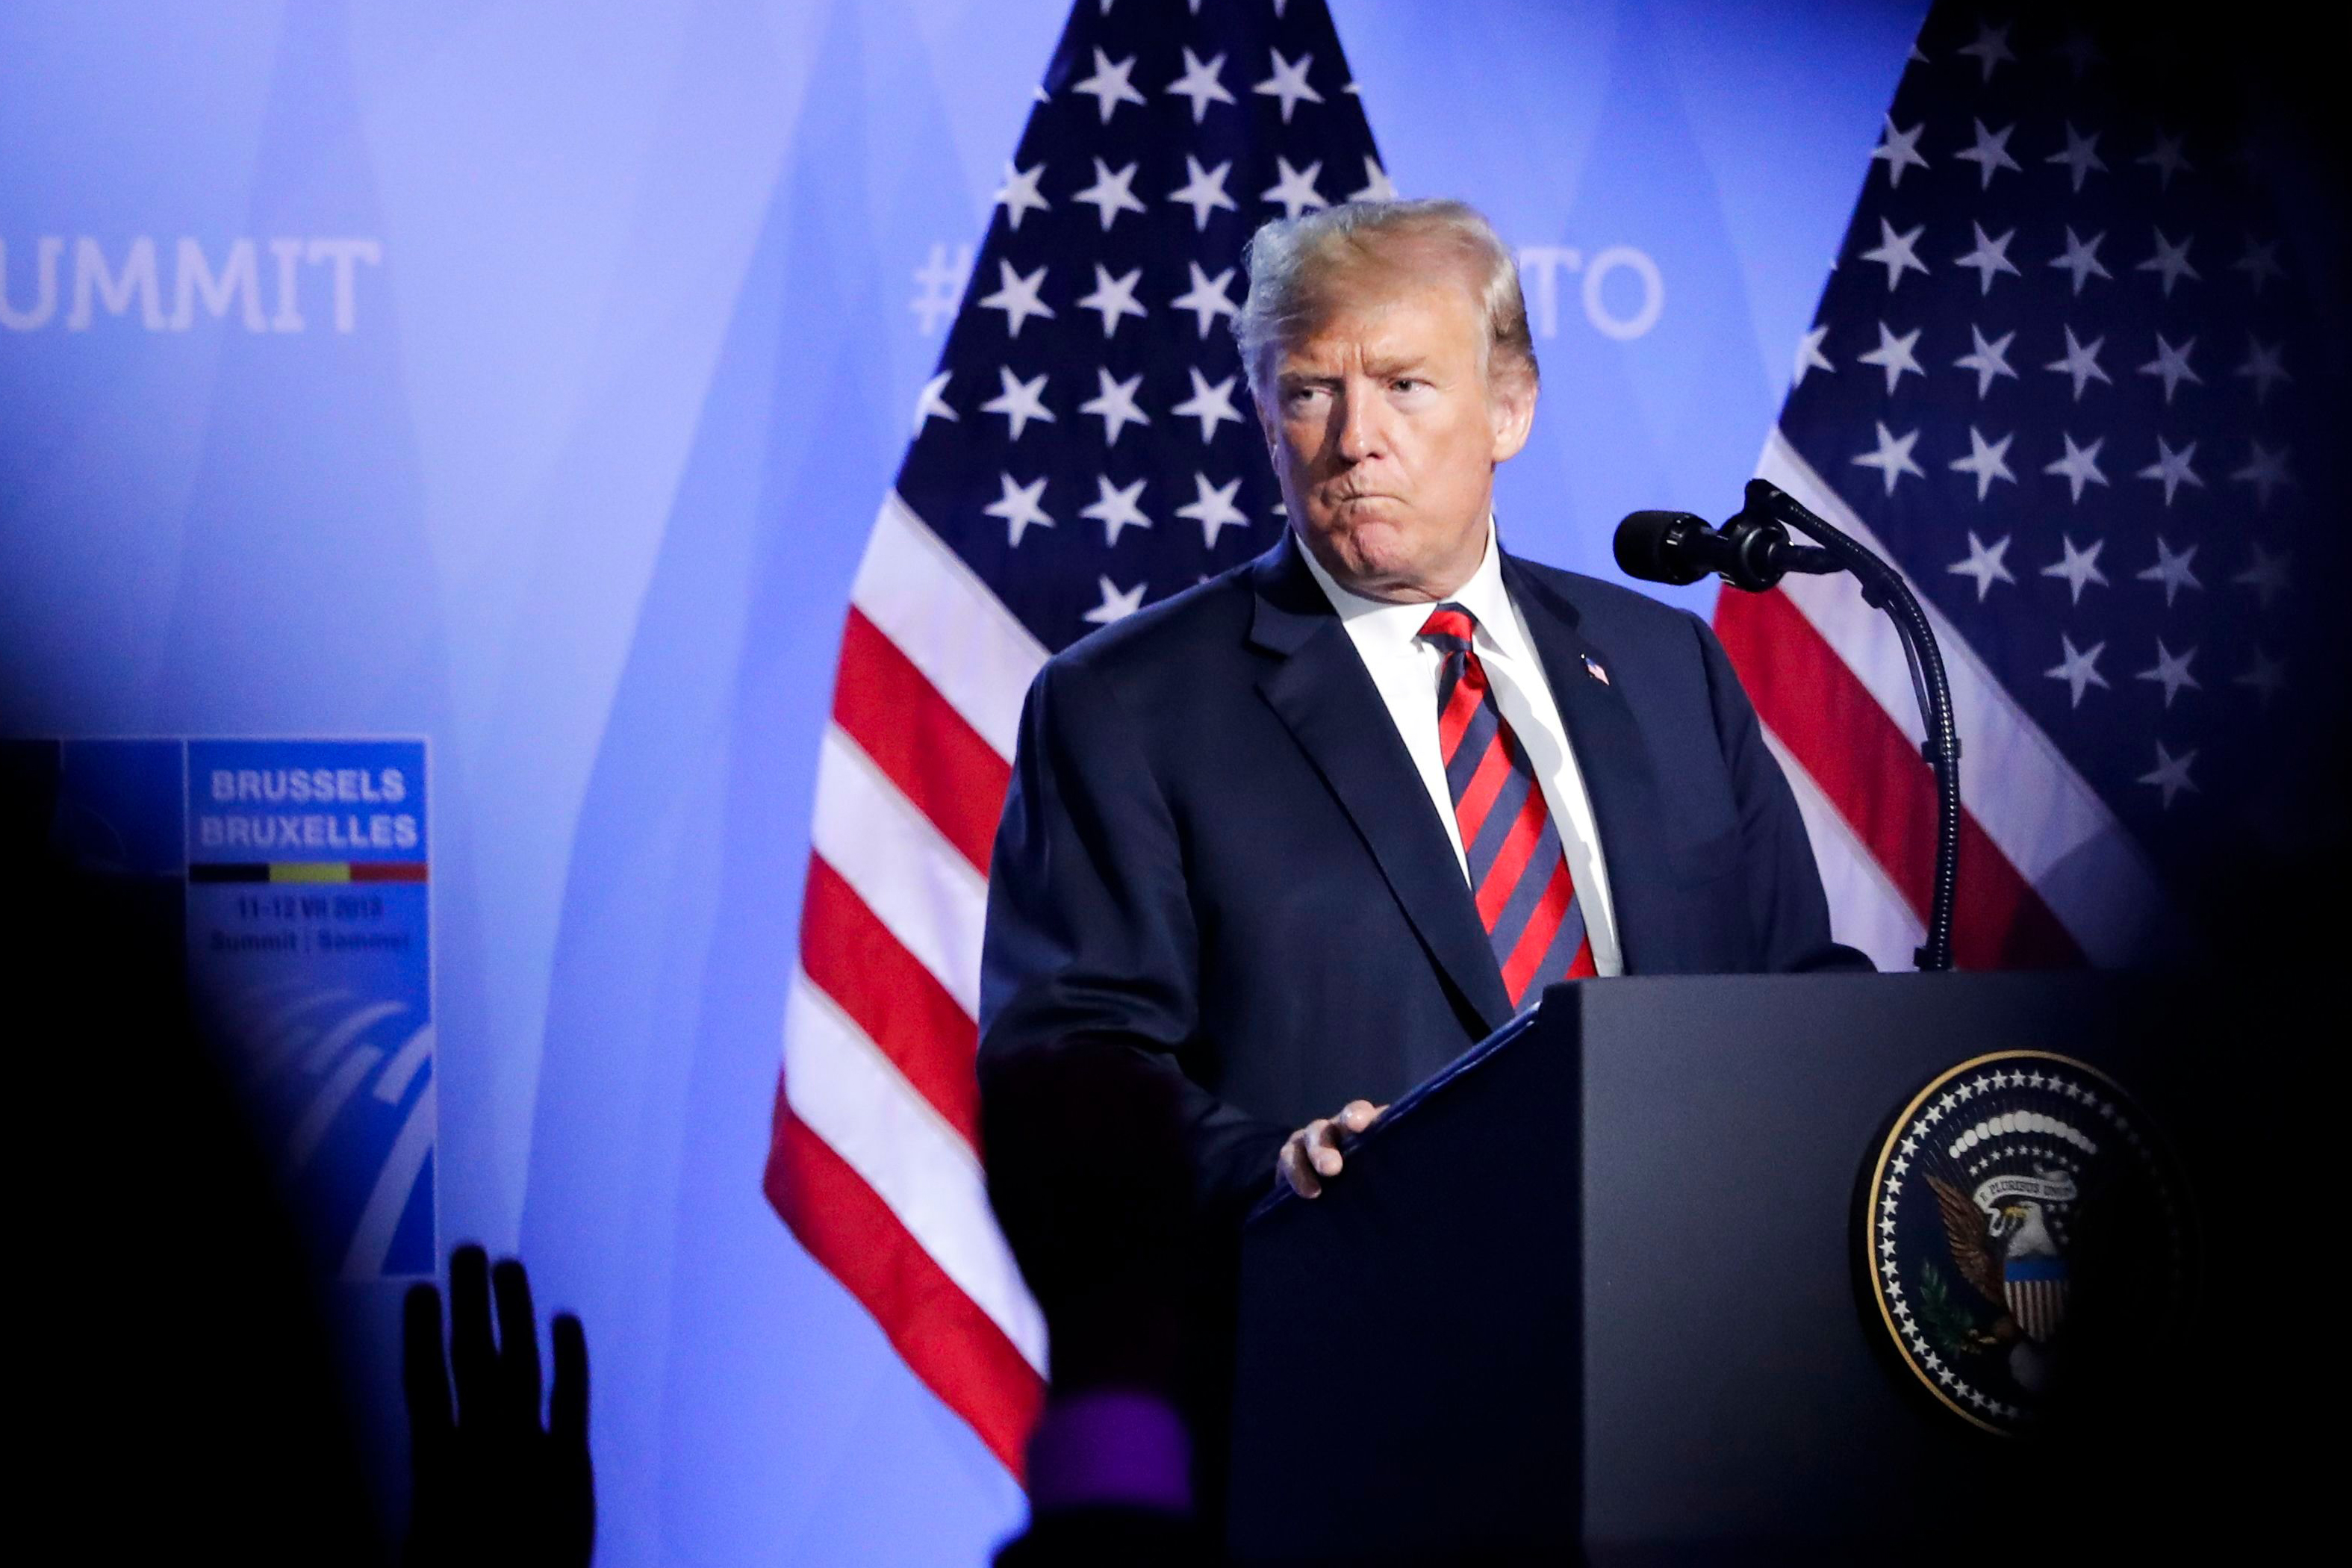 Trump Caps NATO Trip With Wild, Impromptu Press Conference